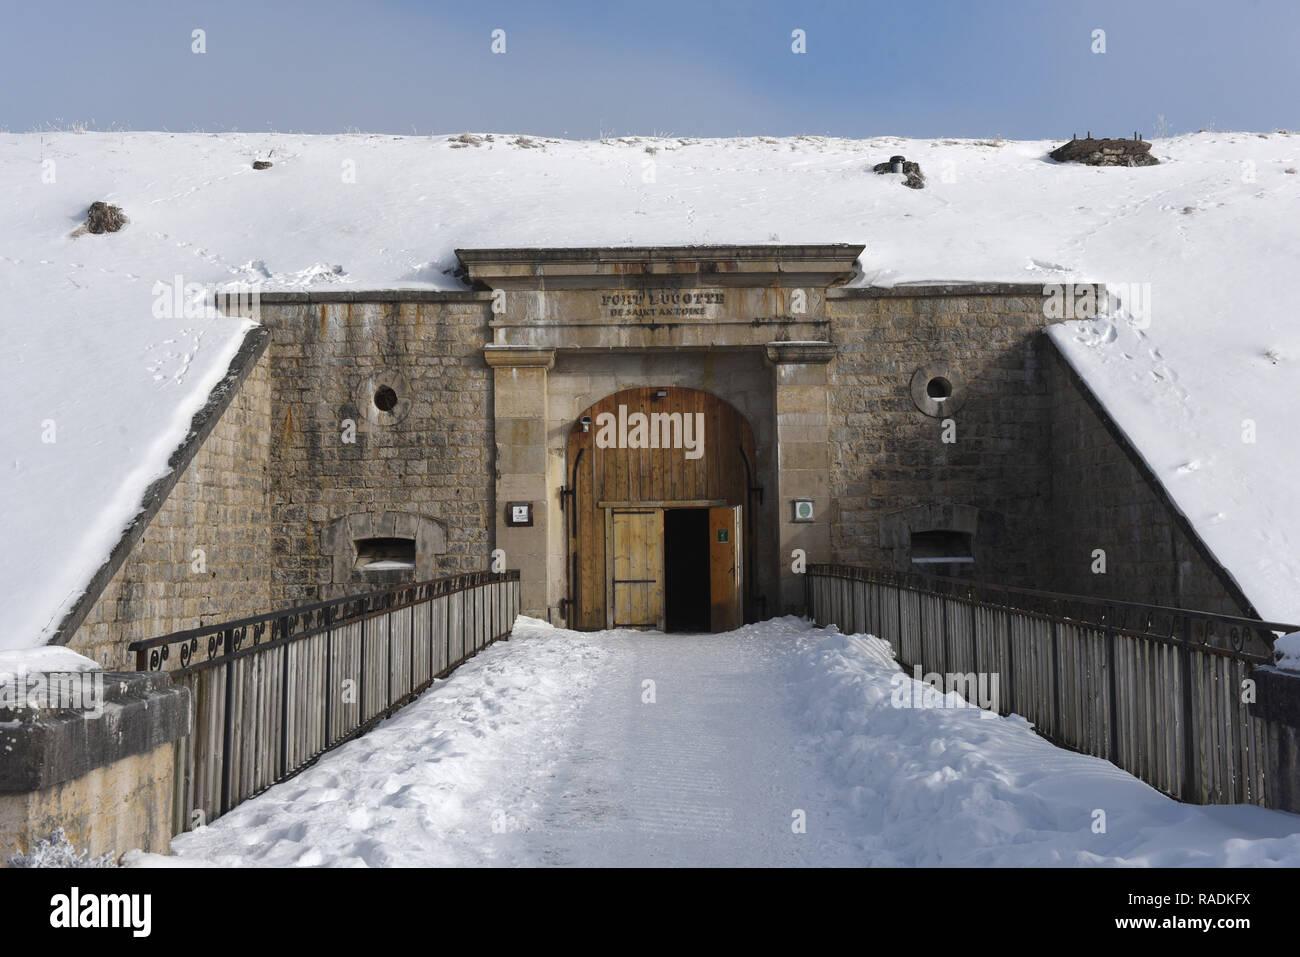 The 'Petite du Fort Saint-Antoine' maturing cellars (eastern France) *** Local Caption *** - Stock Image